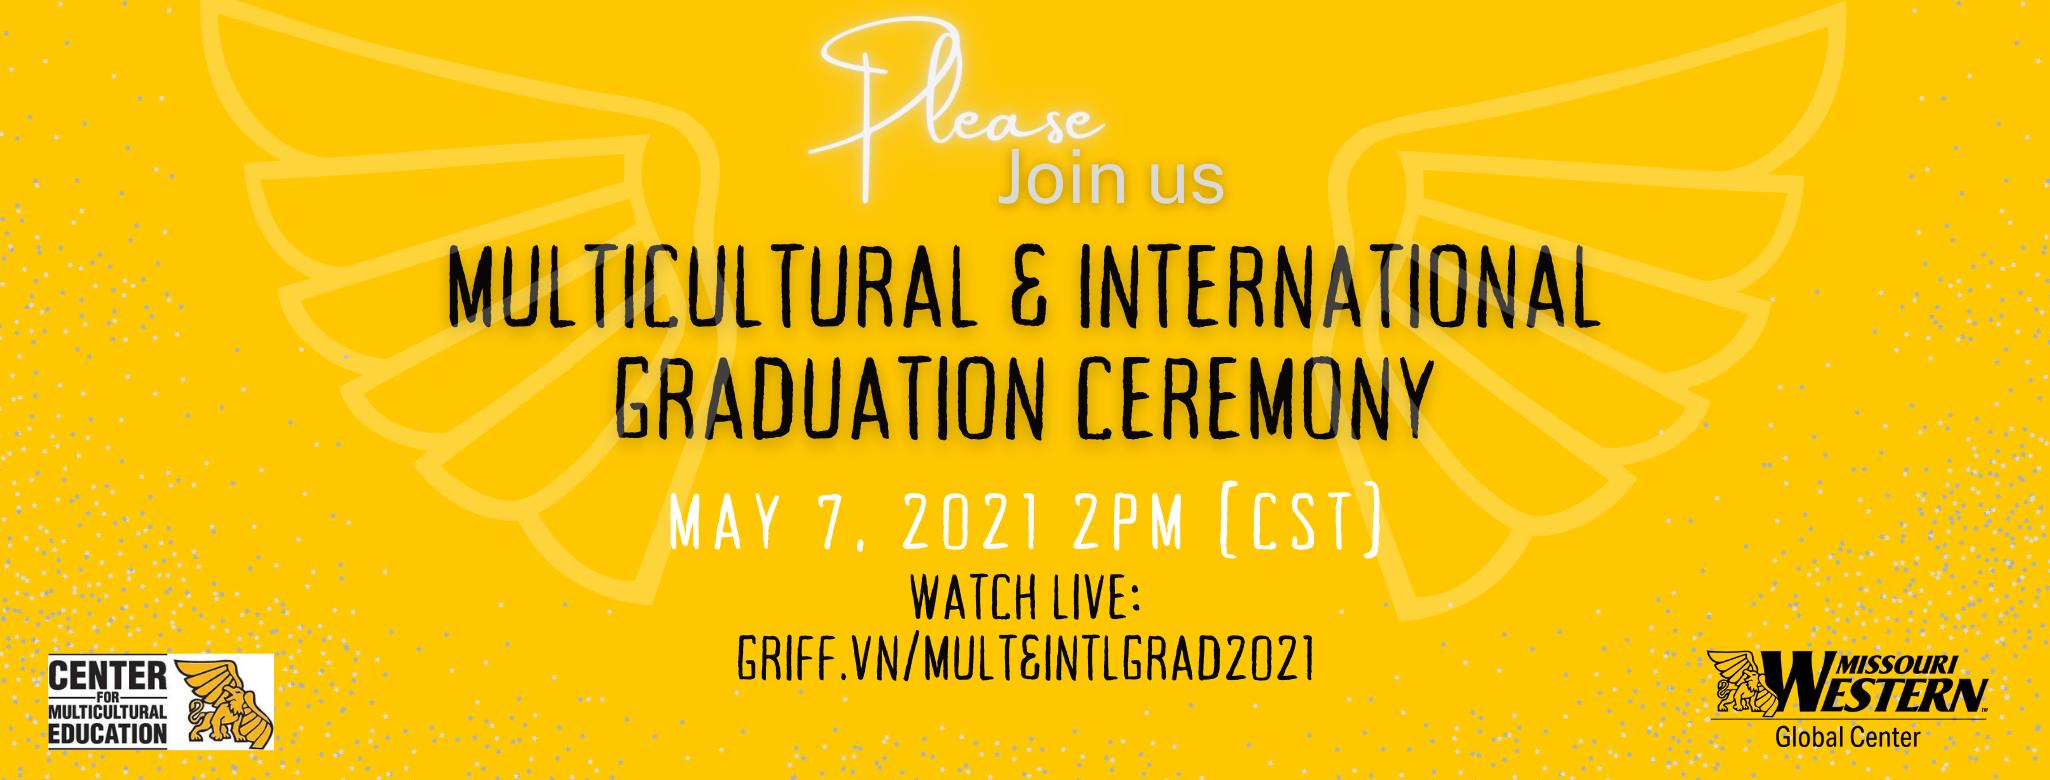 Multicultural & International Graduation